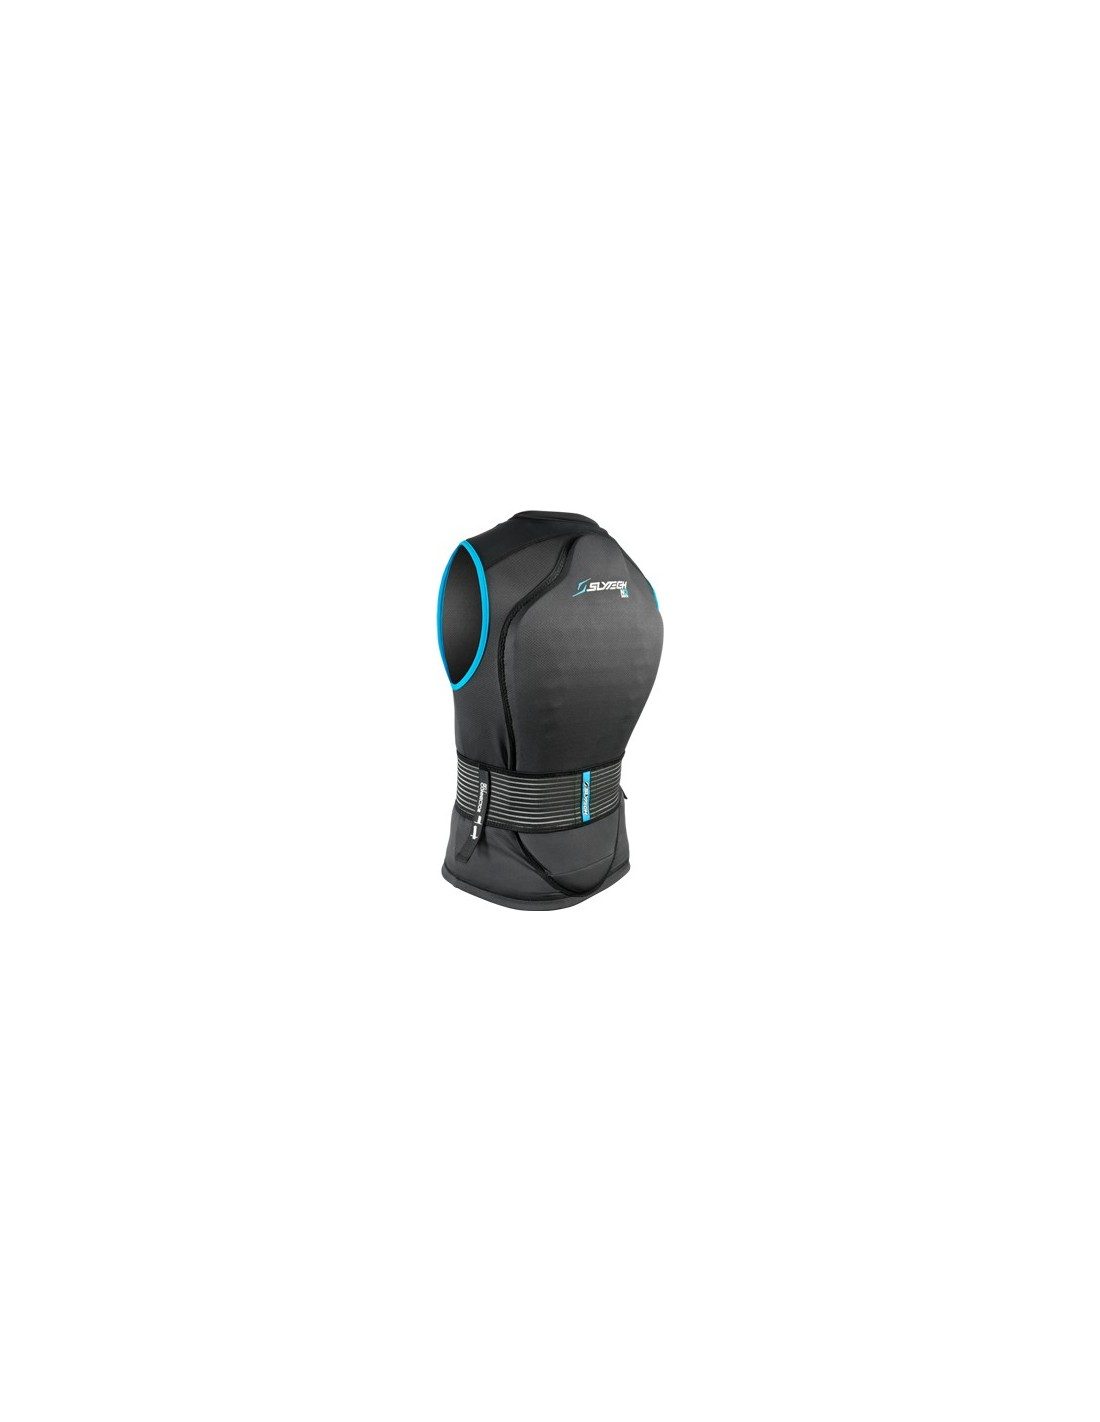 Slytech Vest Backpro Noshock XT Protektorvariante - Rückenprotektoren inkl. Wes